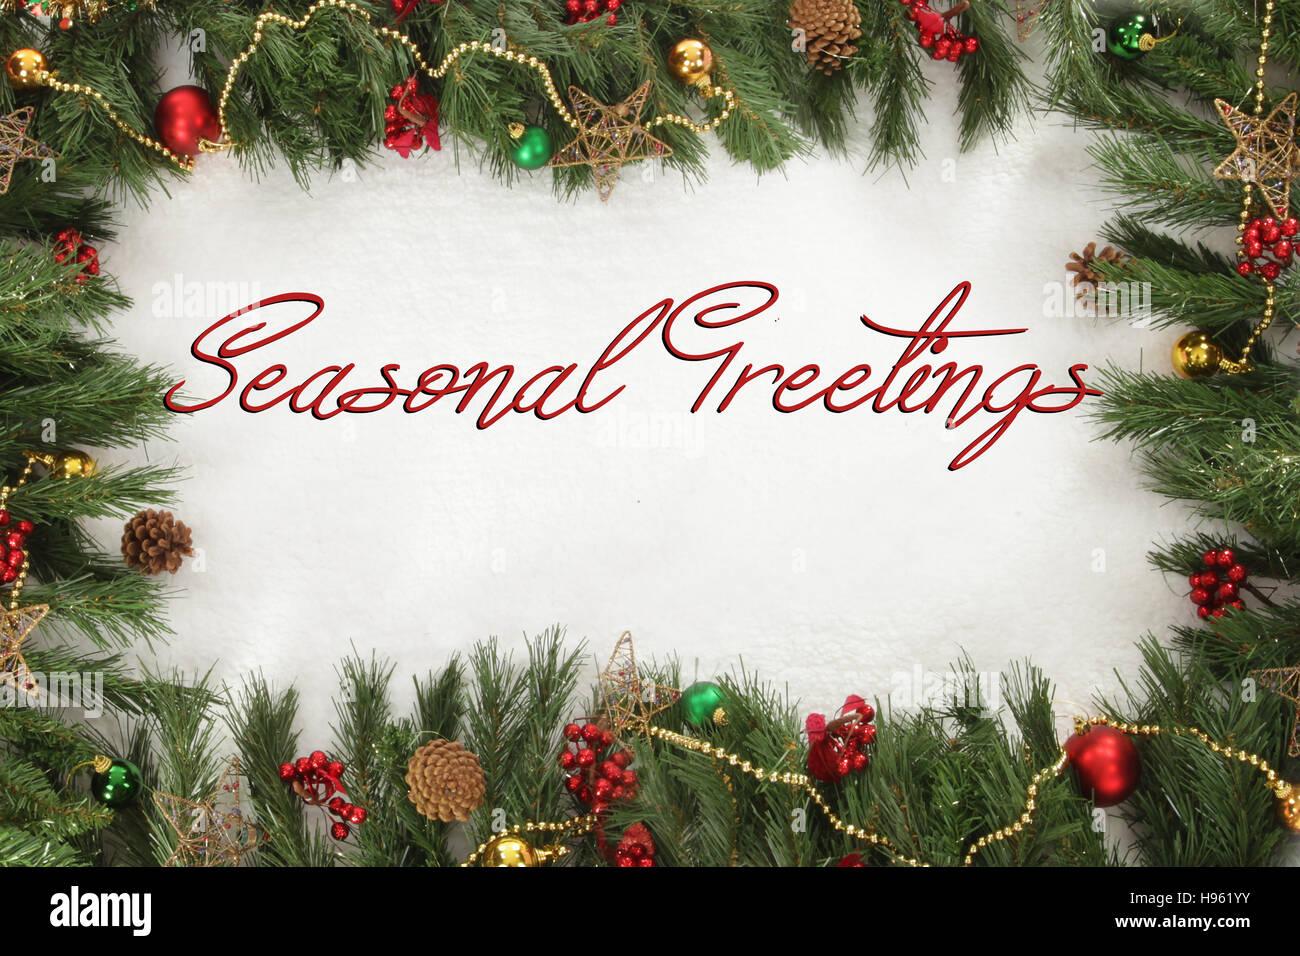 Seasonal greetings festive and seasonal christmas sign stock photo seasonal greetings festive and seasonal christmas sign m4hsunfo